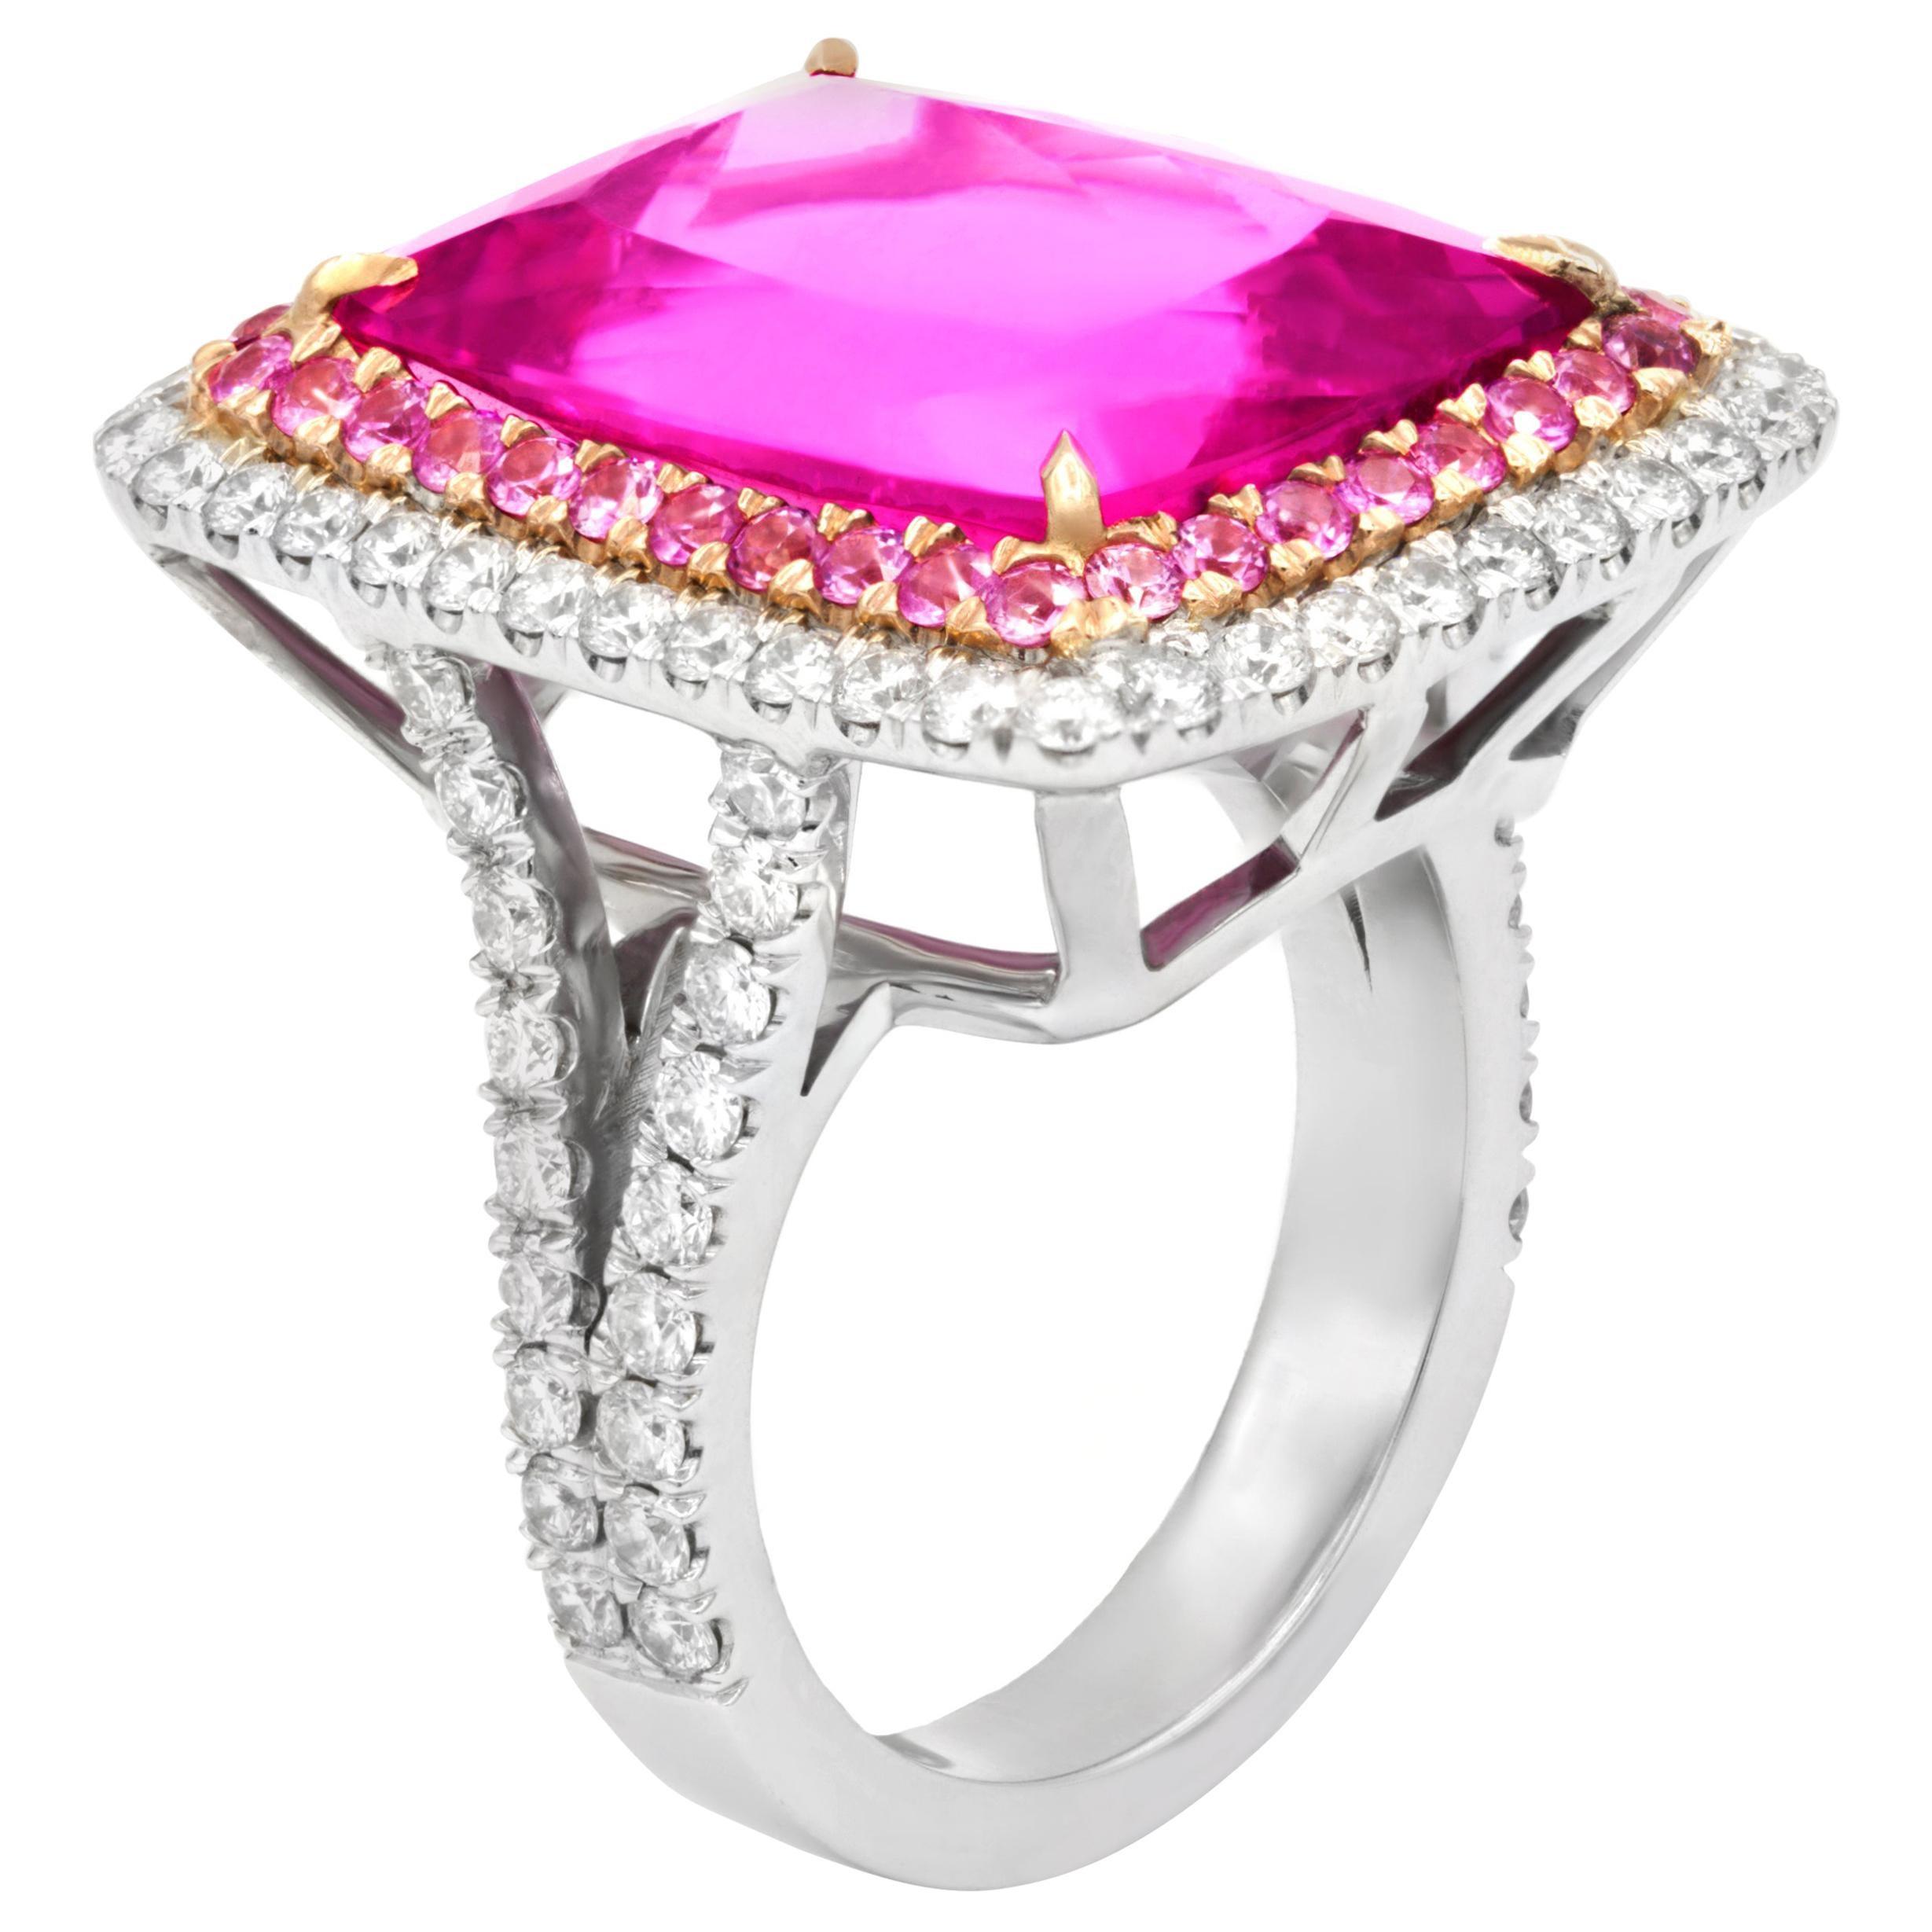 16.60 Carat Pink Tourmaline and Diamond Ring